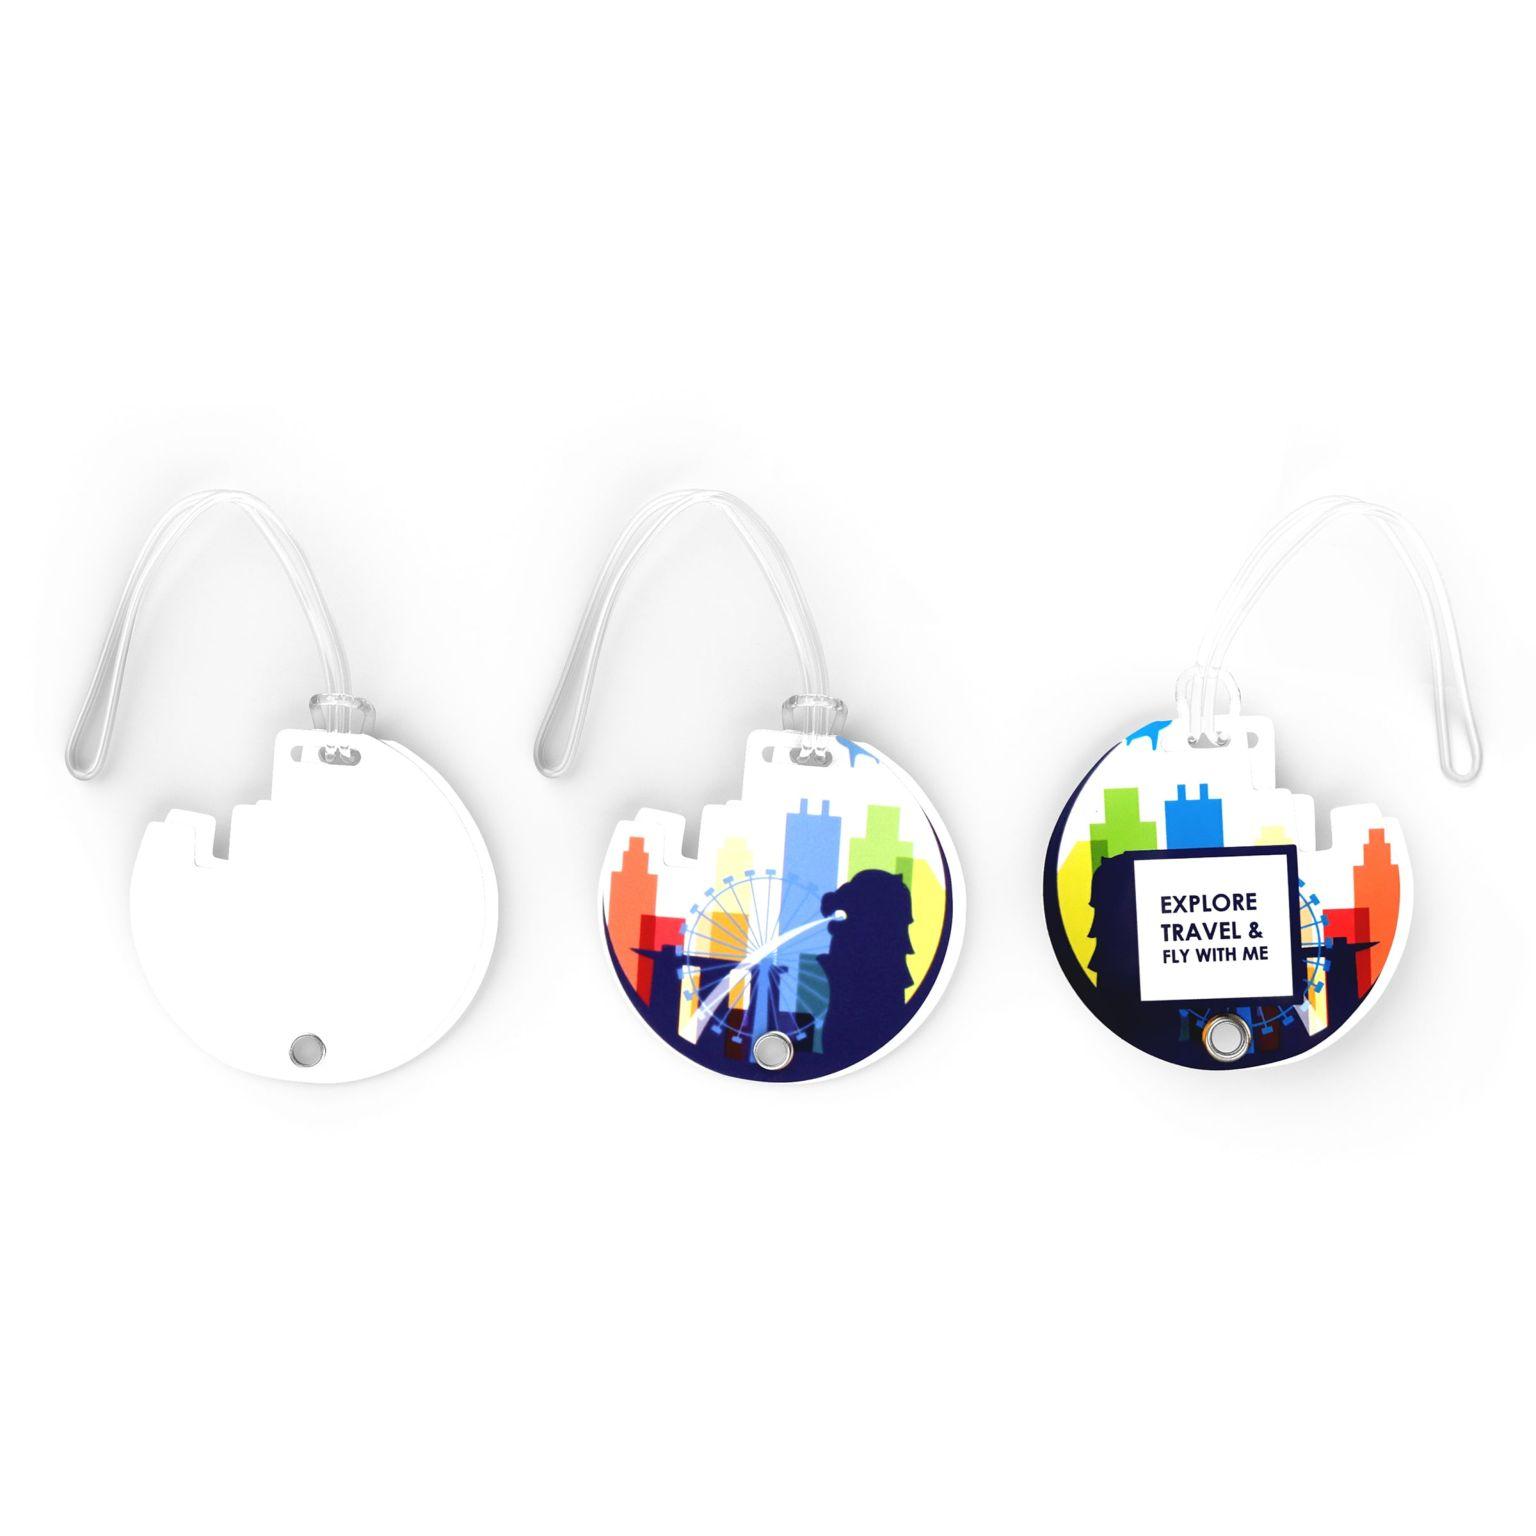 Luggage Tag Contour Blanc avec impression quadri - ISOCOM - OBJETS ET TEXTILES PERSONNALISES - NANTES